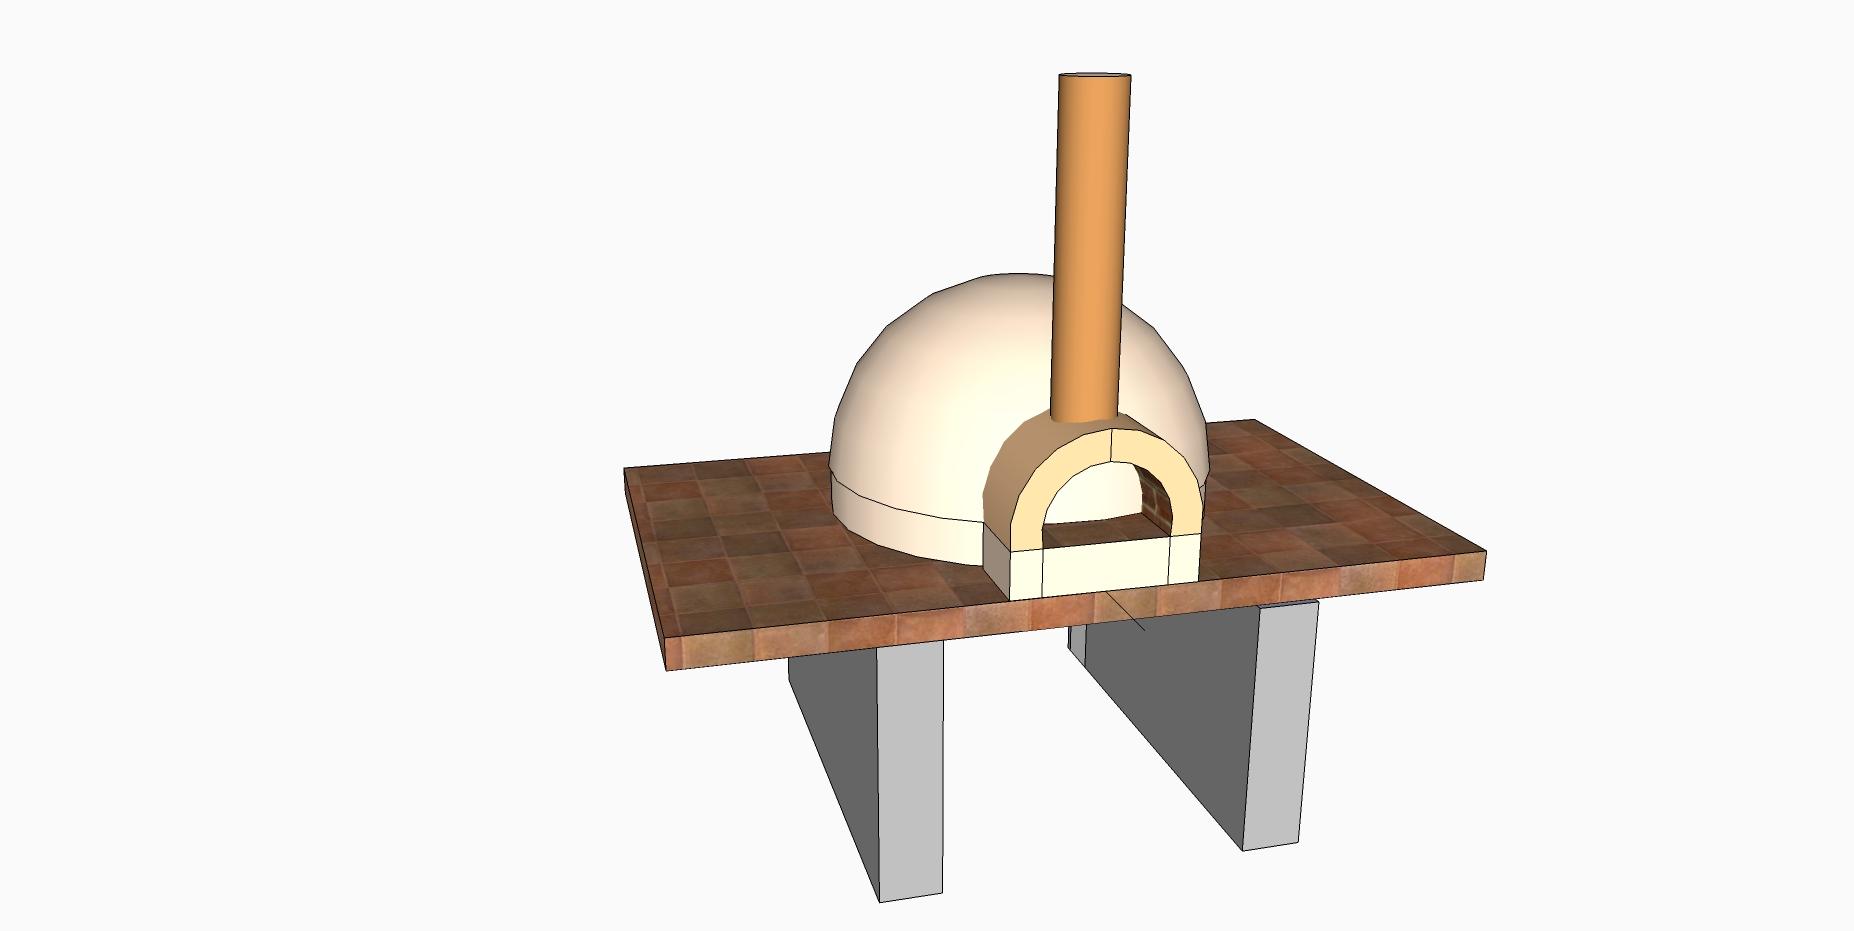 barrel stave adirondack chair plans bent wood rocking dome pizza oven pdf download planter – defiant61shj